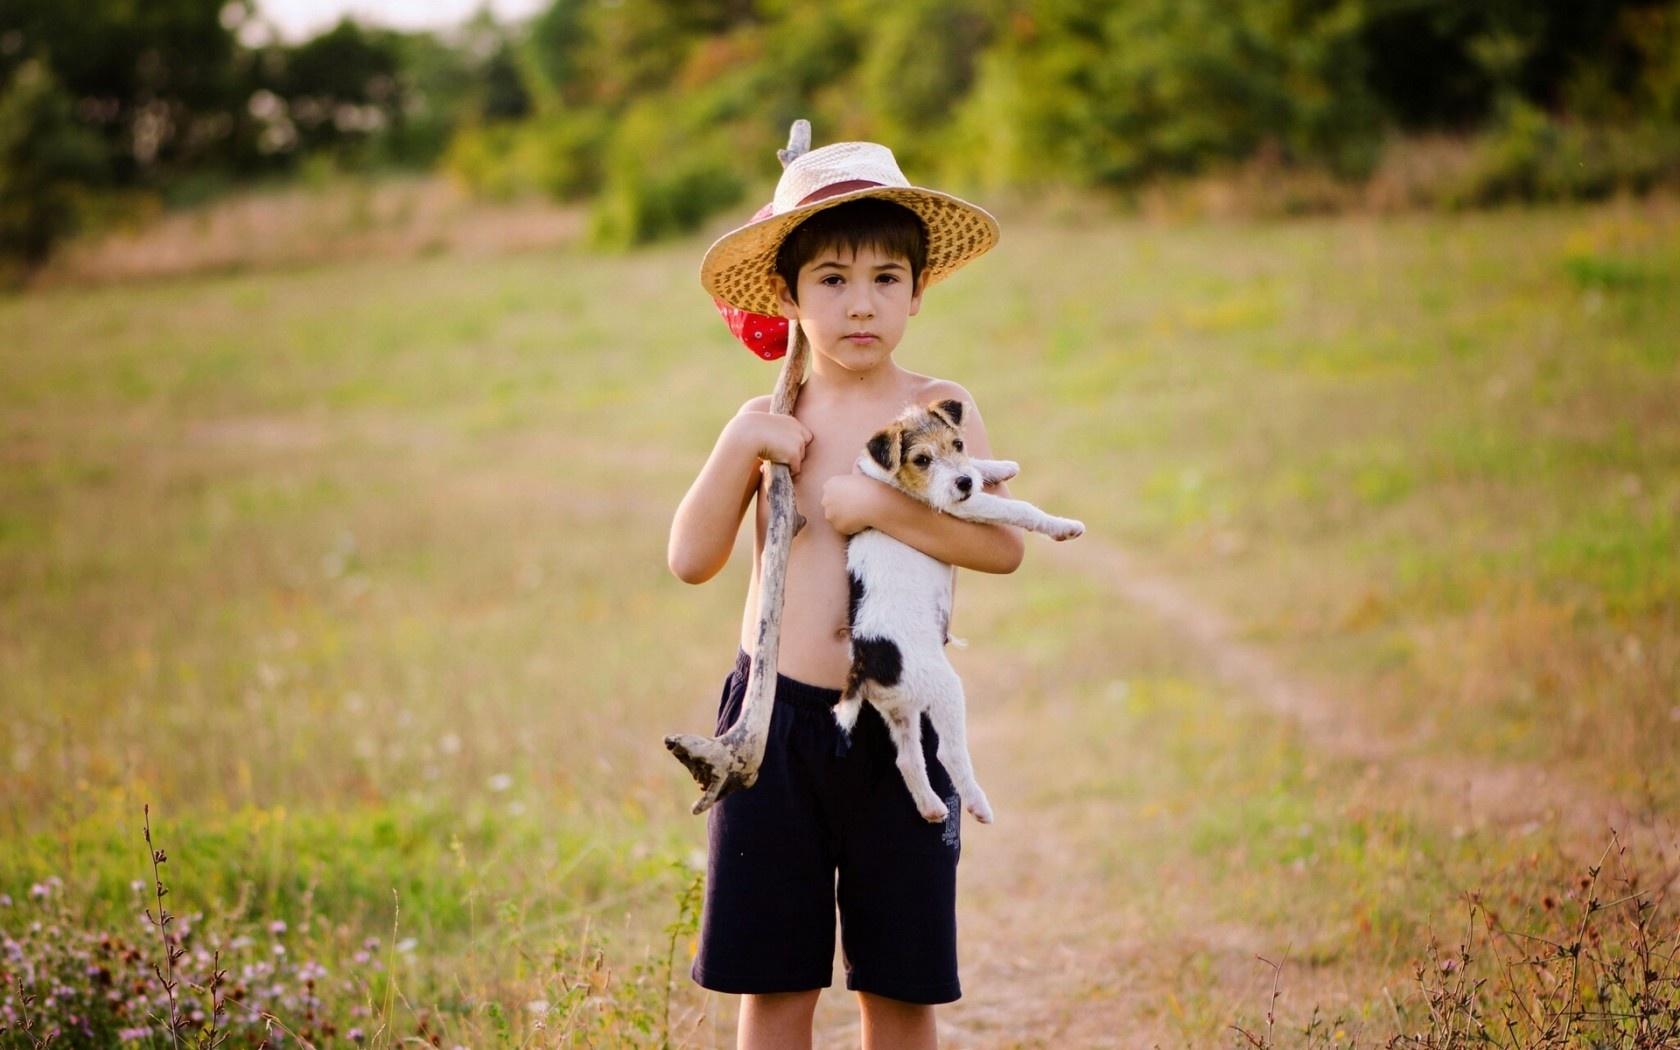 Cute Boy Hd Images Download Vinny Oleo Vegetal Info